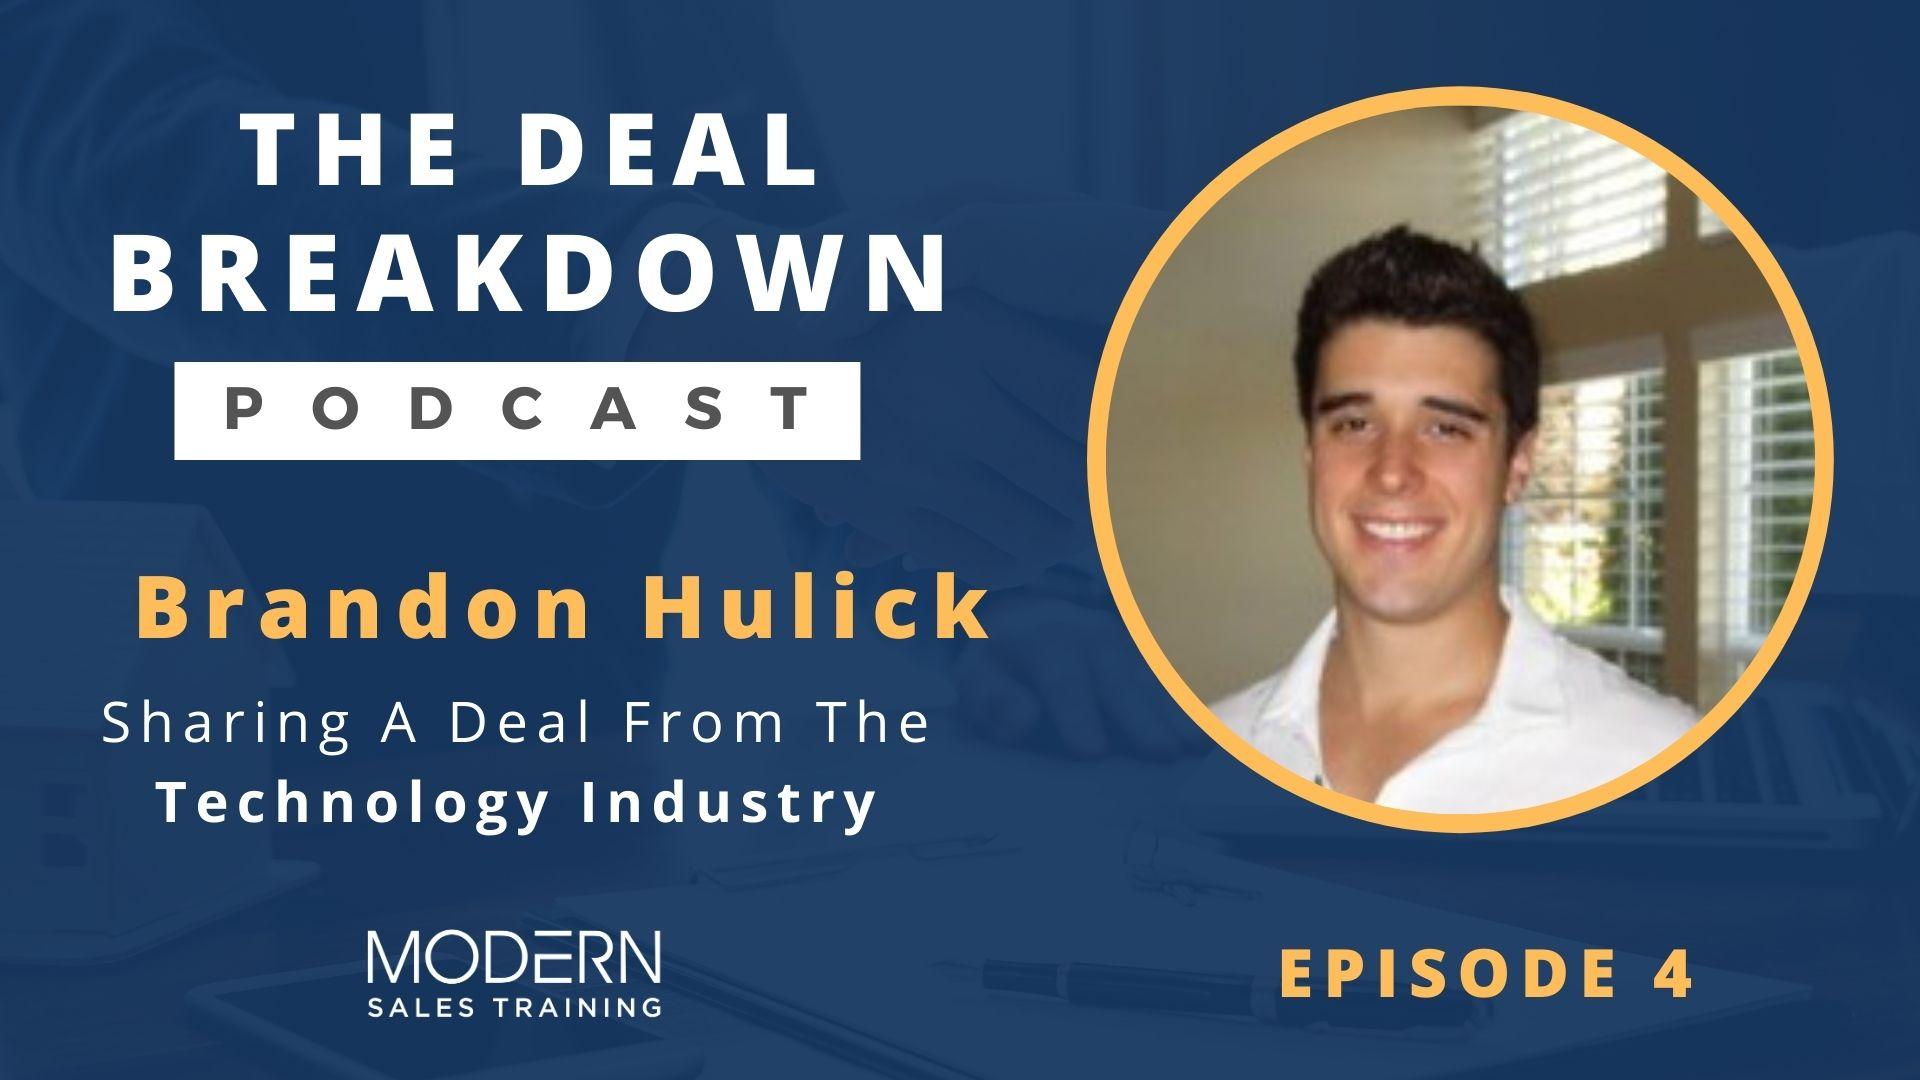 The-Deal-Breakdown-Podcast-Modern-Sales-Training-Brandon-Hulick